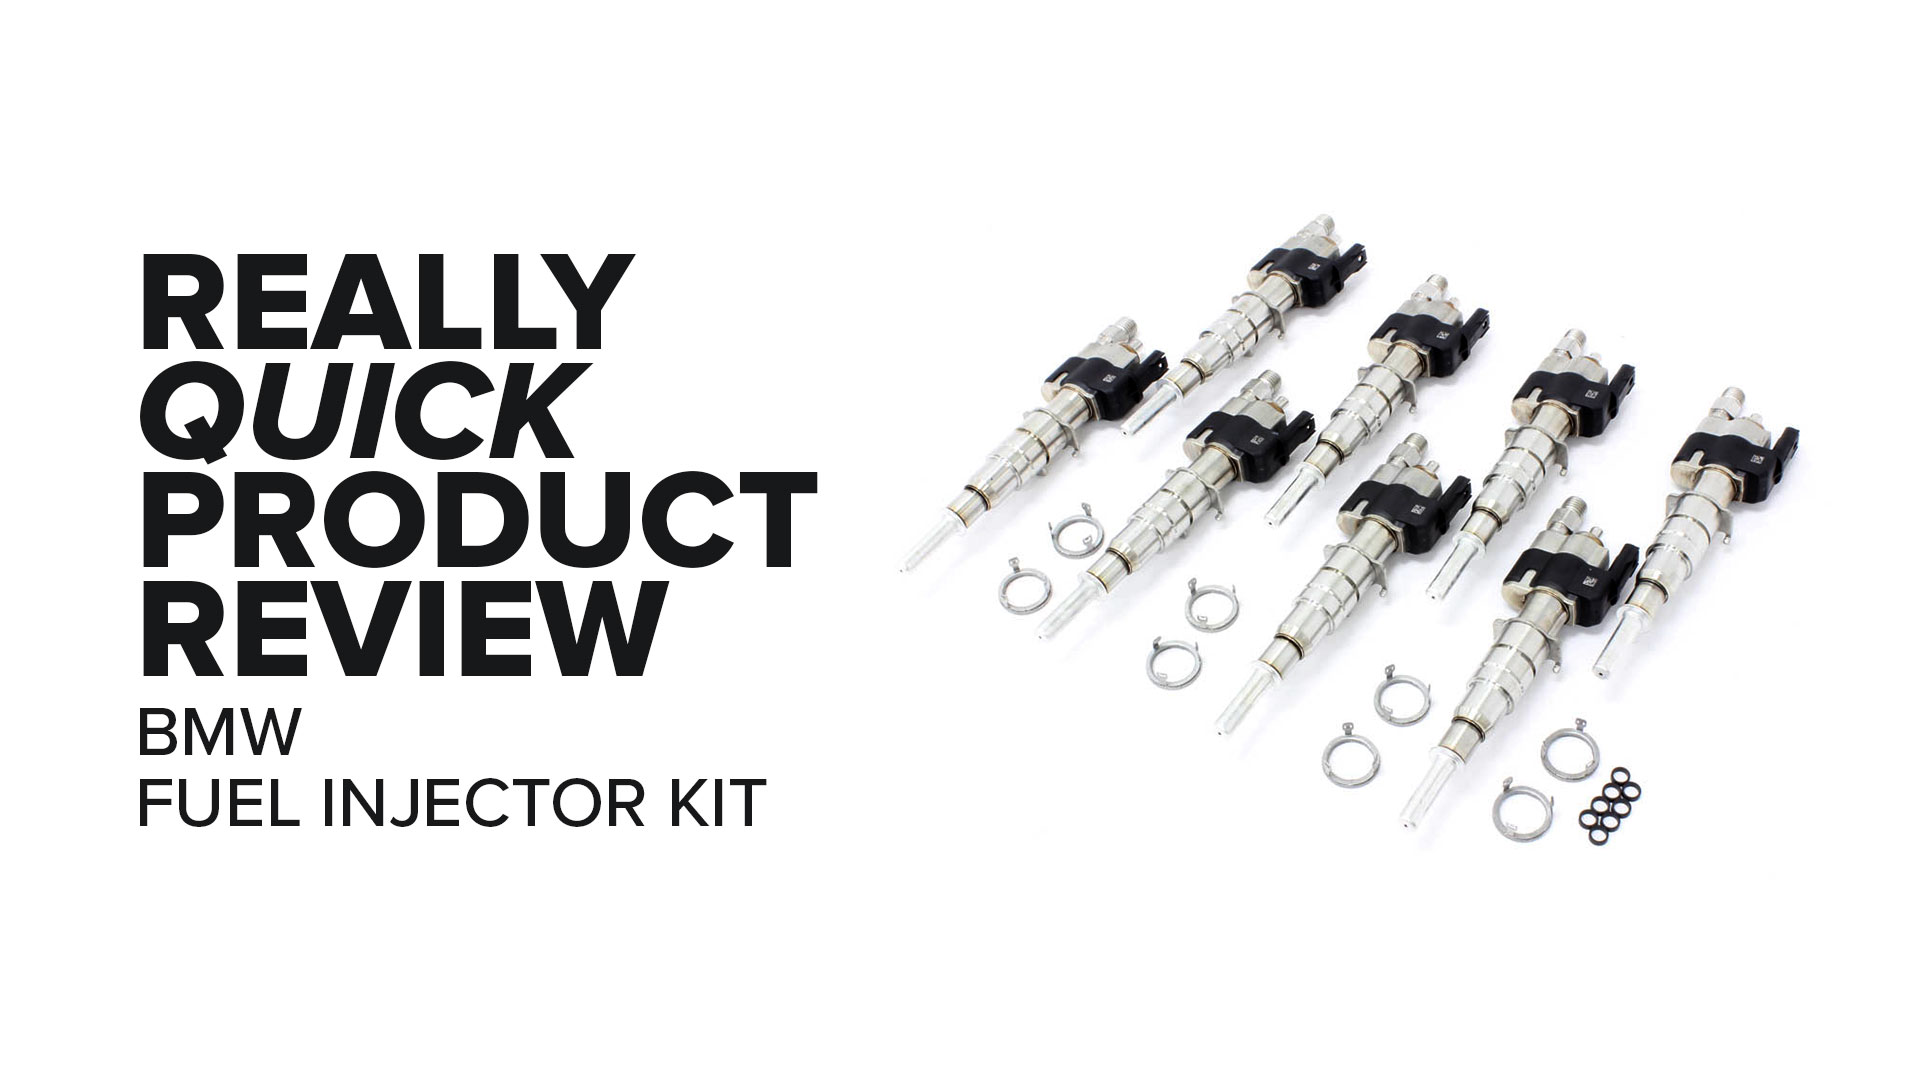 BMW X5, 550i, 650i, & More (N63 & S63) Fuel Injector Kit